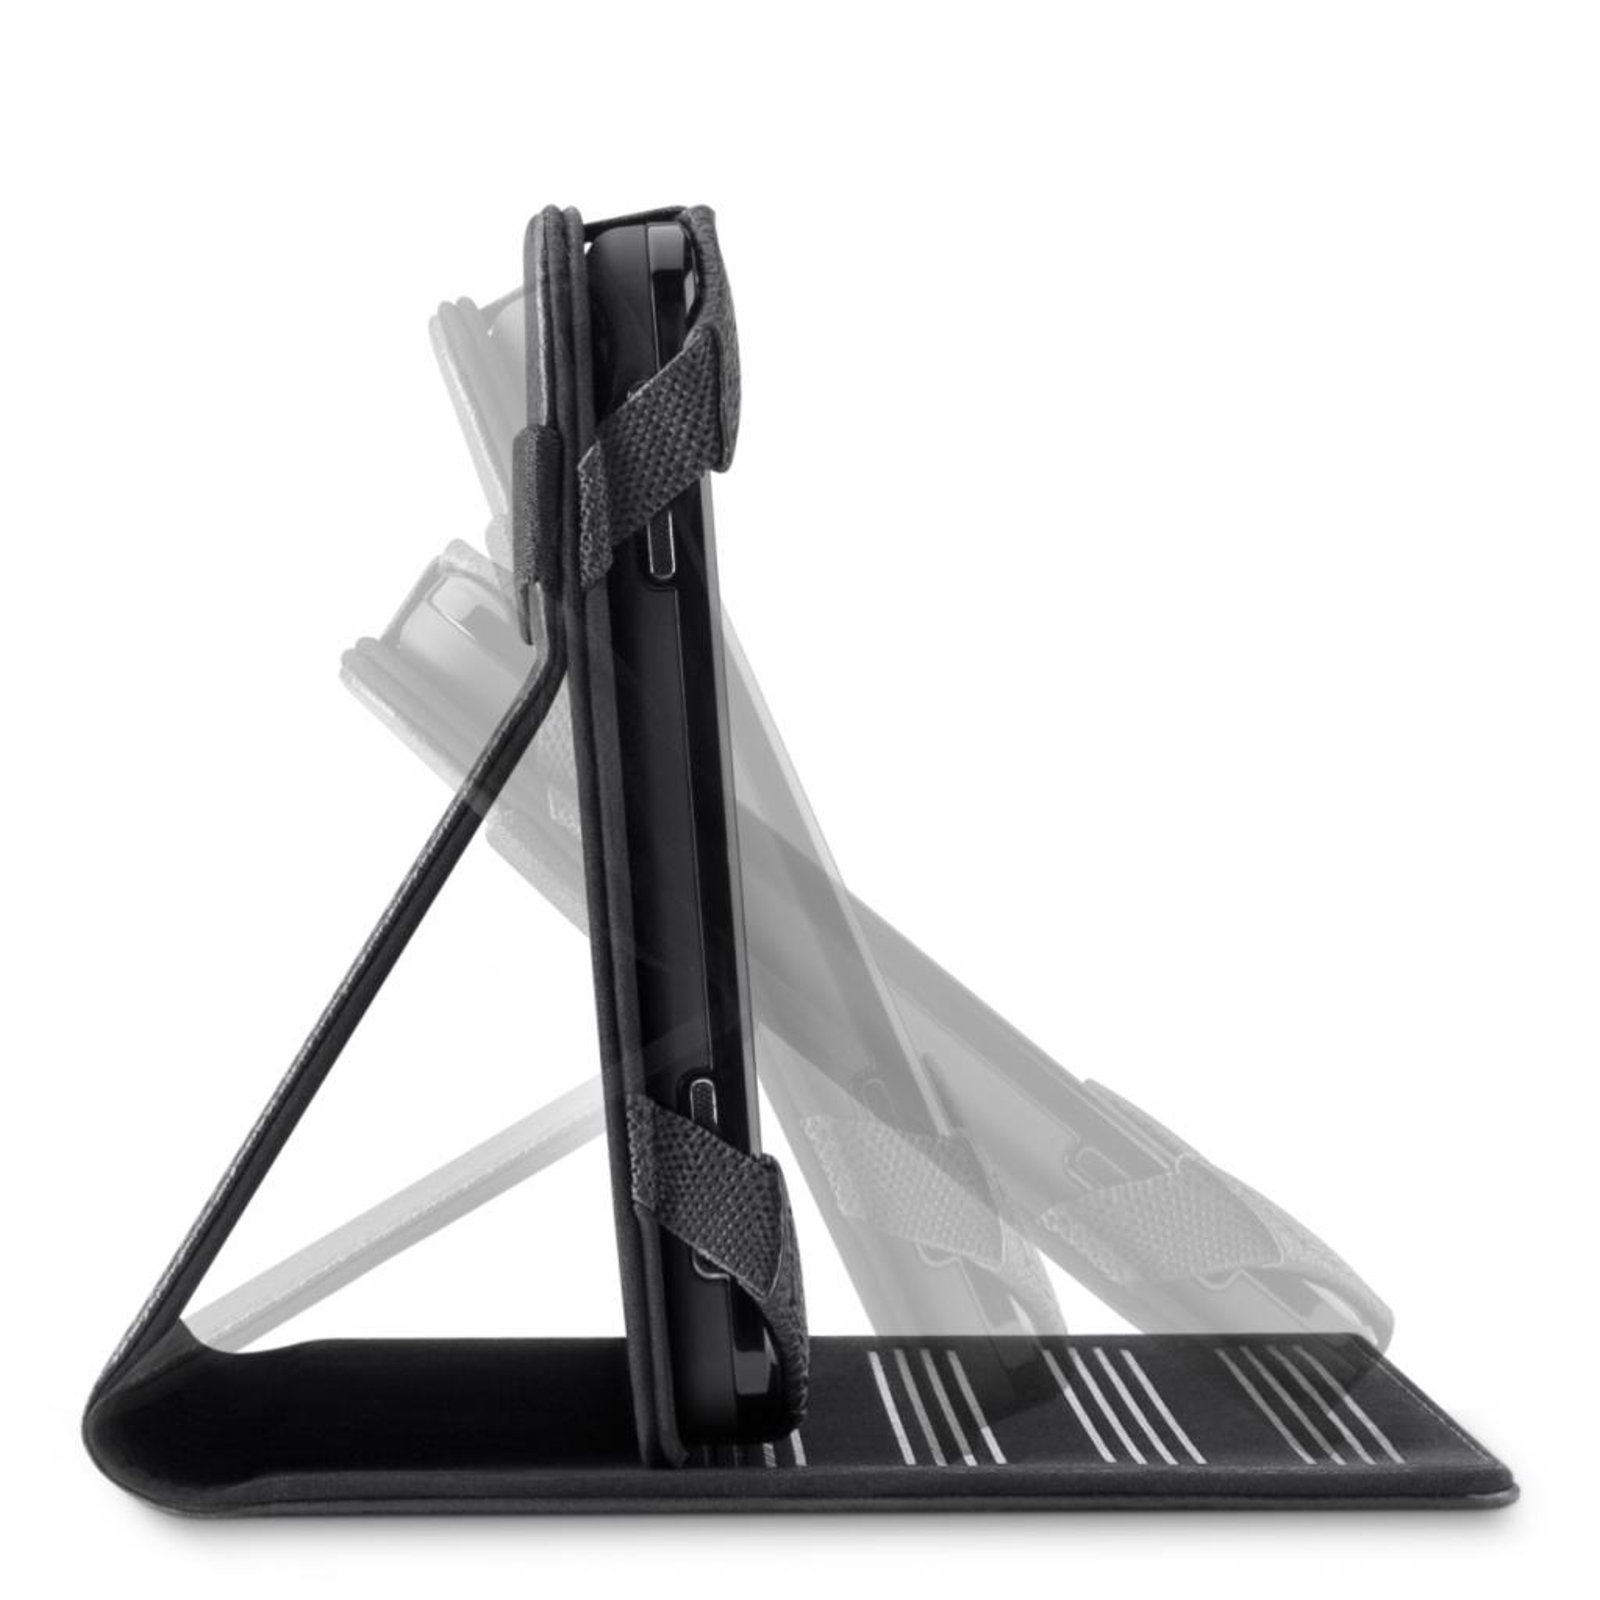 Чехол для планшета Belkin 7 Universal, Verve Tab Folio Stand black-red (F8N672ttC01) изображение 3